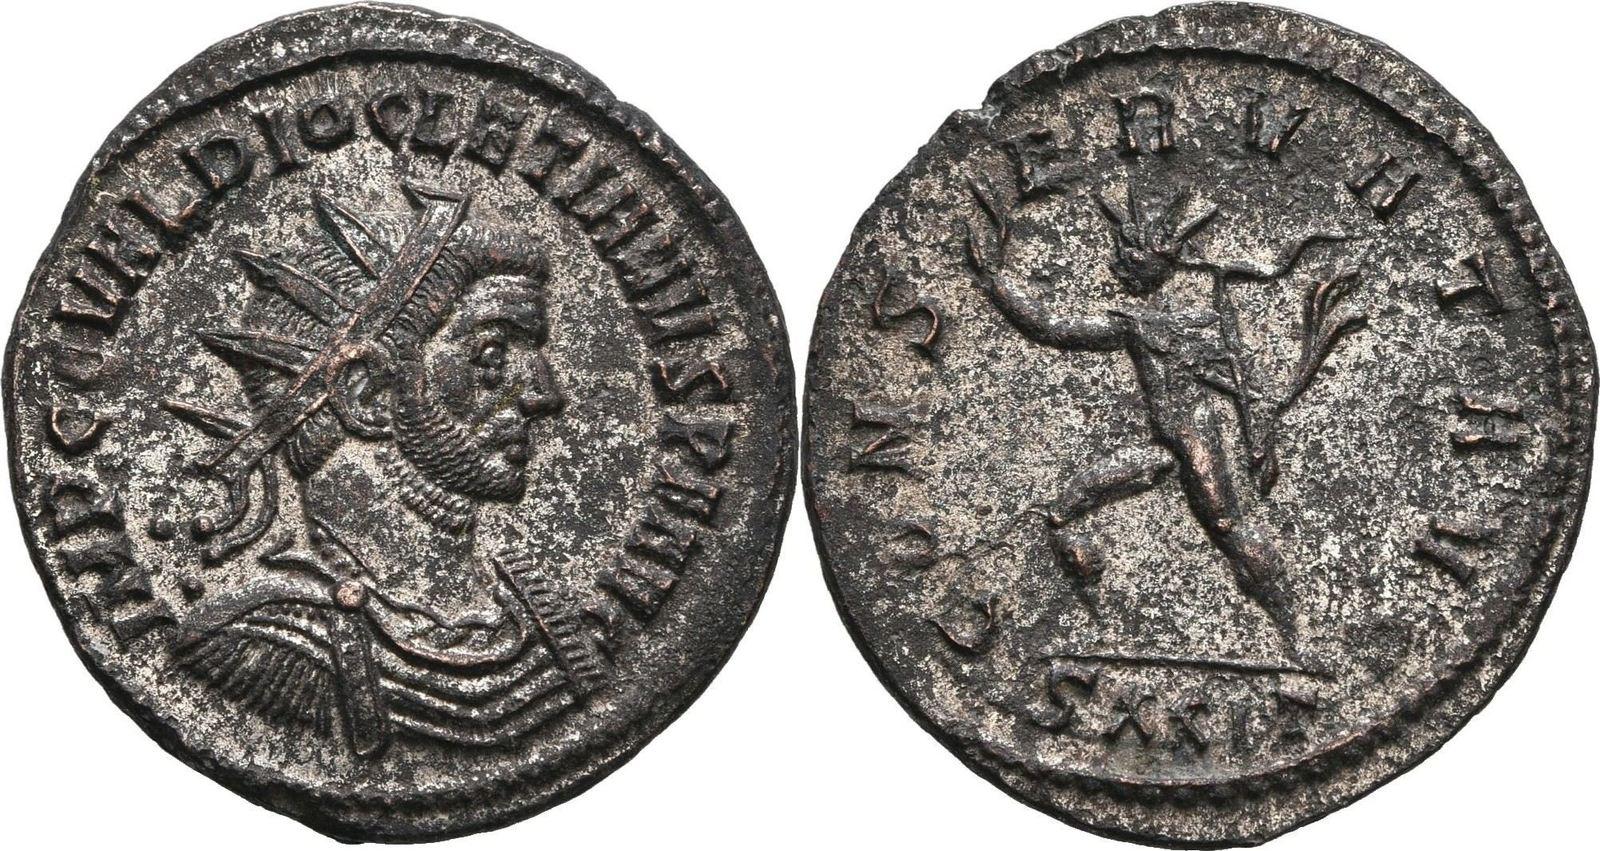 RÖMISCHE KAISERZEIT Antoninian 285-286 Diocletian, 284-305